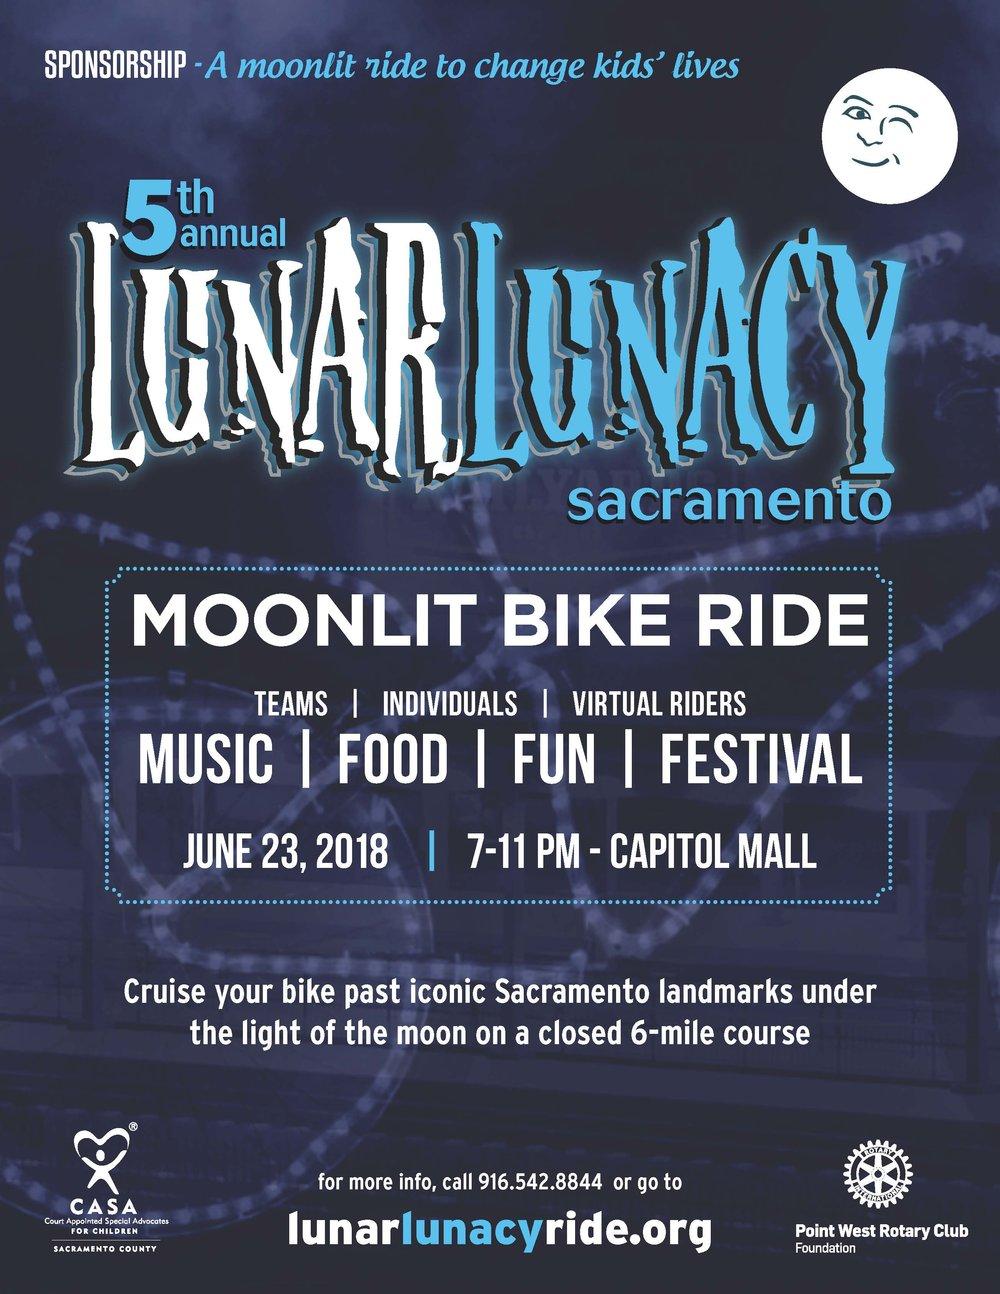 lunar-lunacy_sponsorship_2018 v7 1.jpg